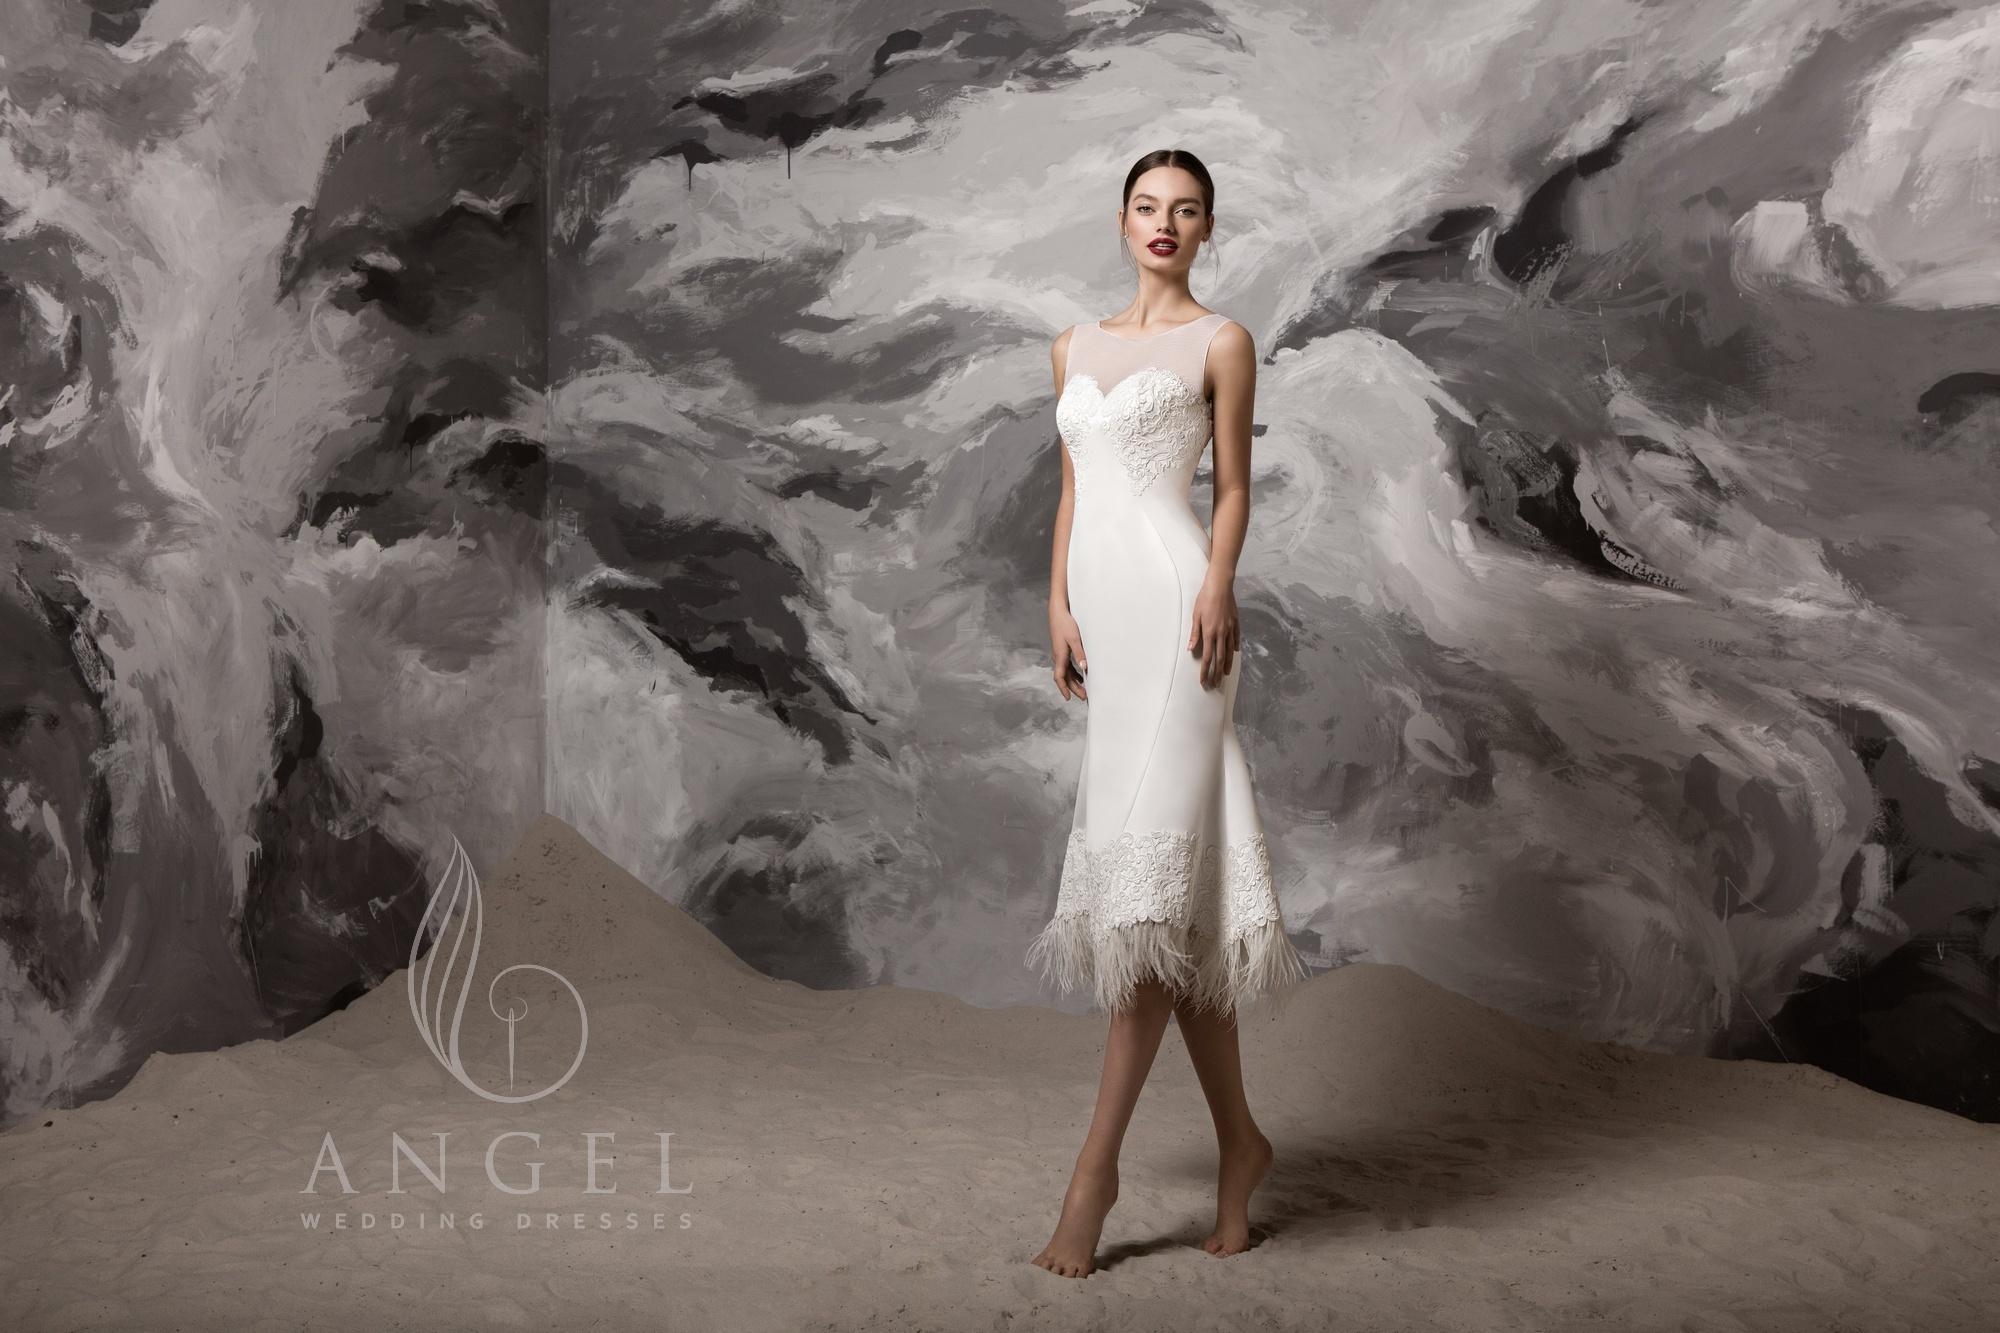 https://angel-novias.com/images/stories/virtuemart/product/Swan.jpg